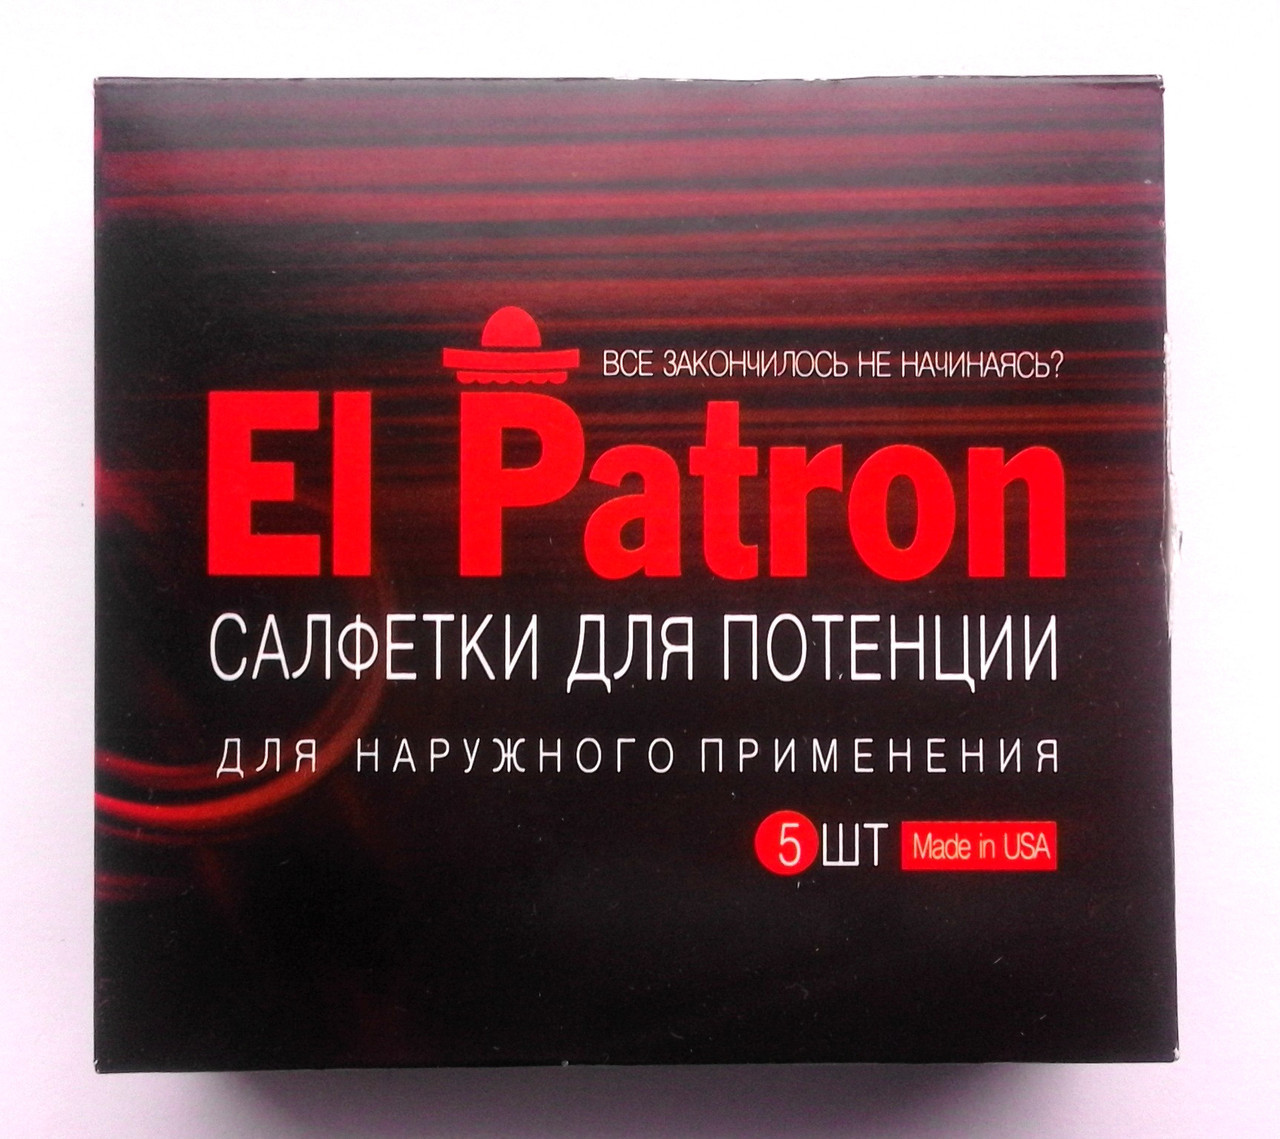 El Patron (Эль Патрон) салфетки для потенции 5шт 12667